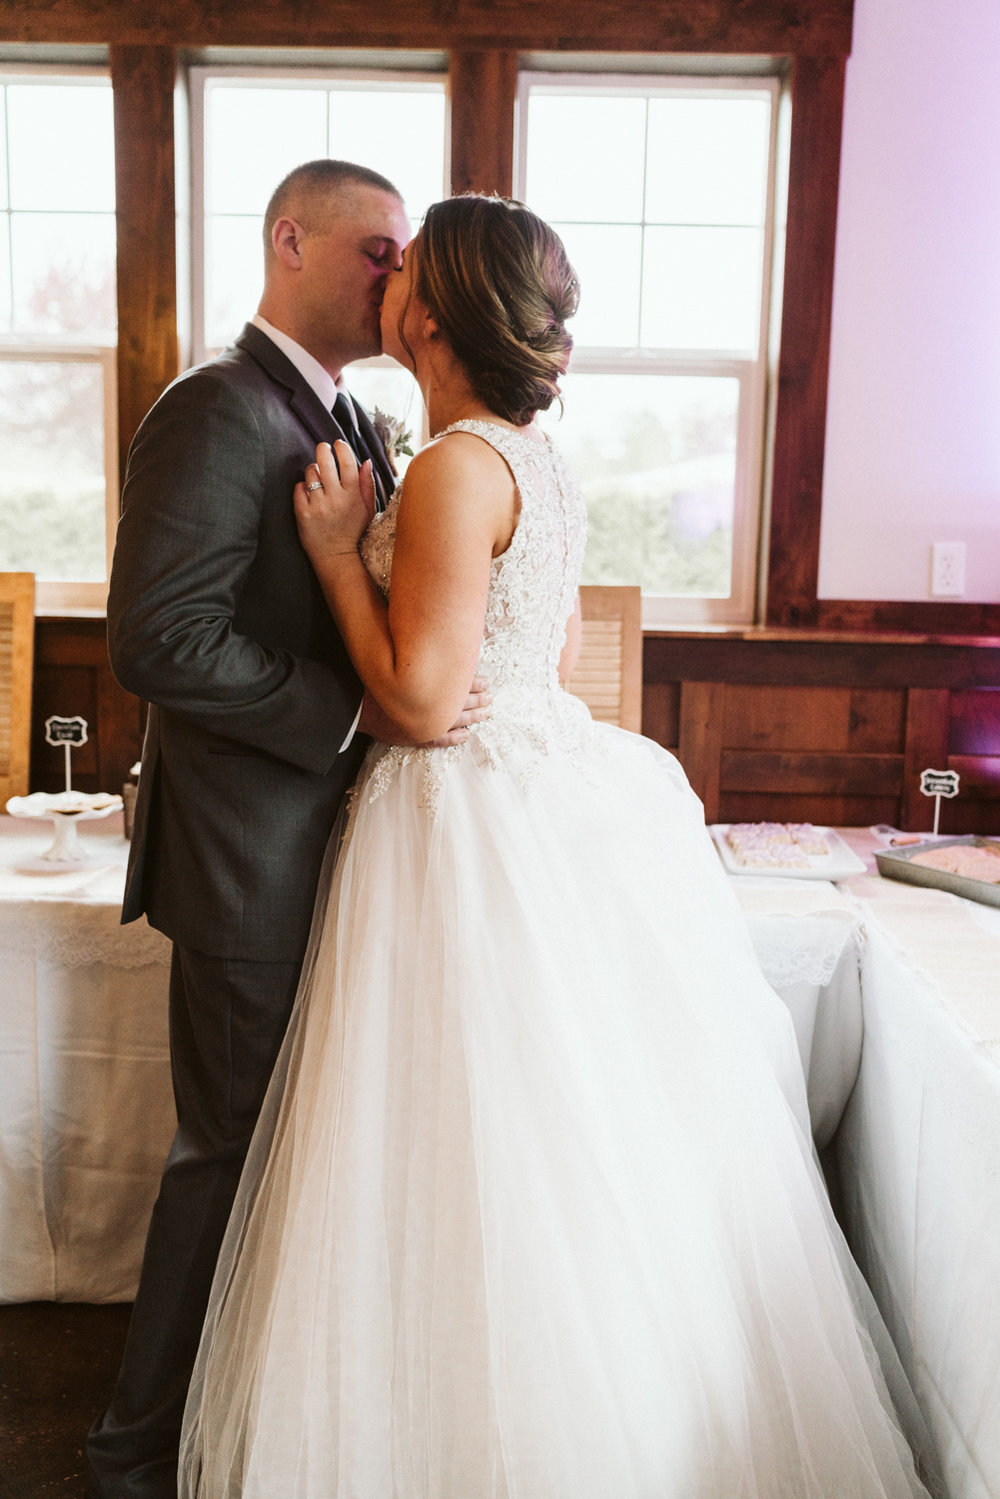 April Yentas Photography - jen and anthony wedding-74.jpg